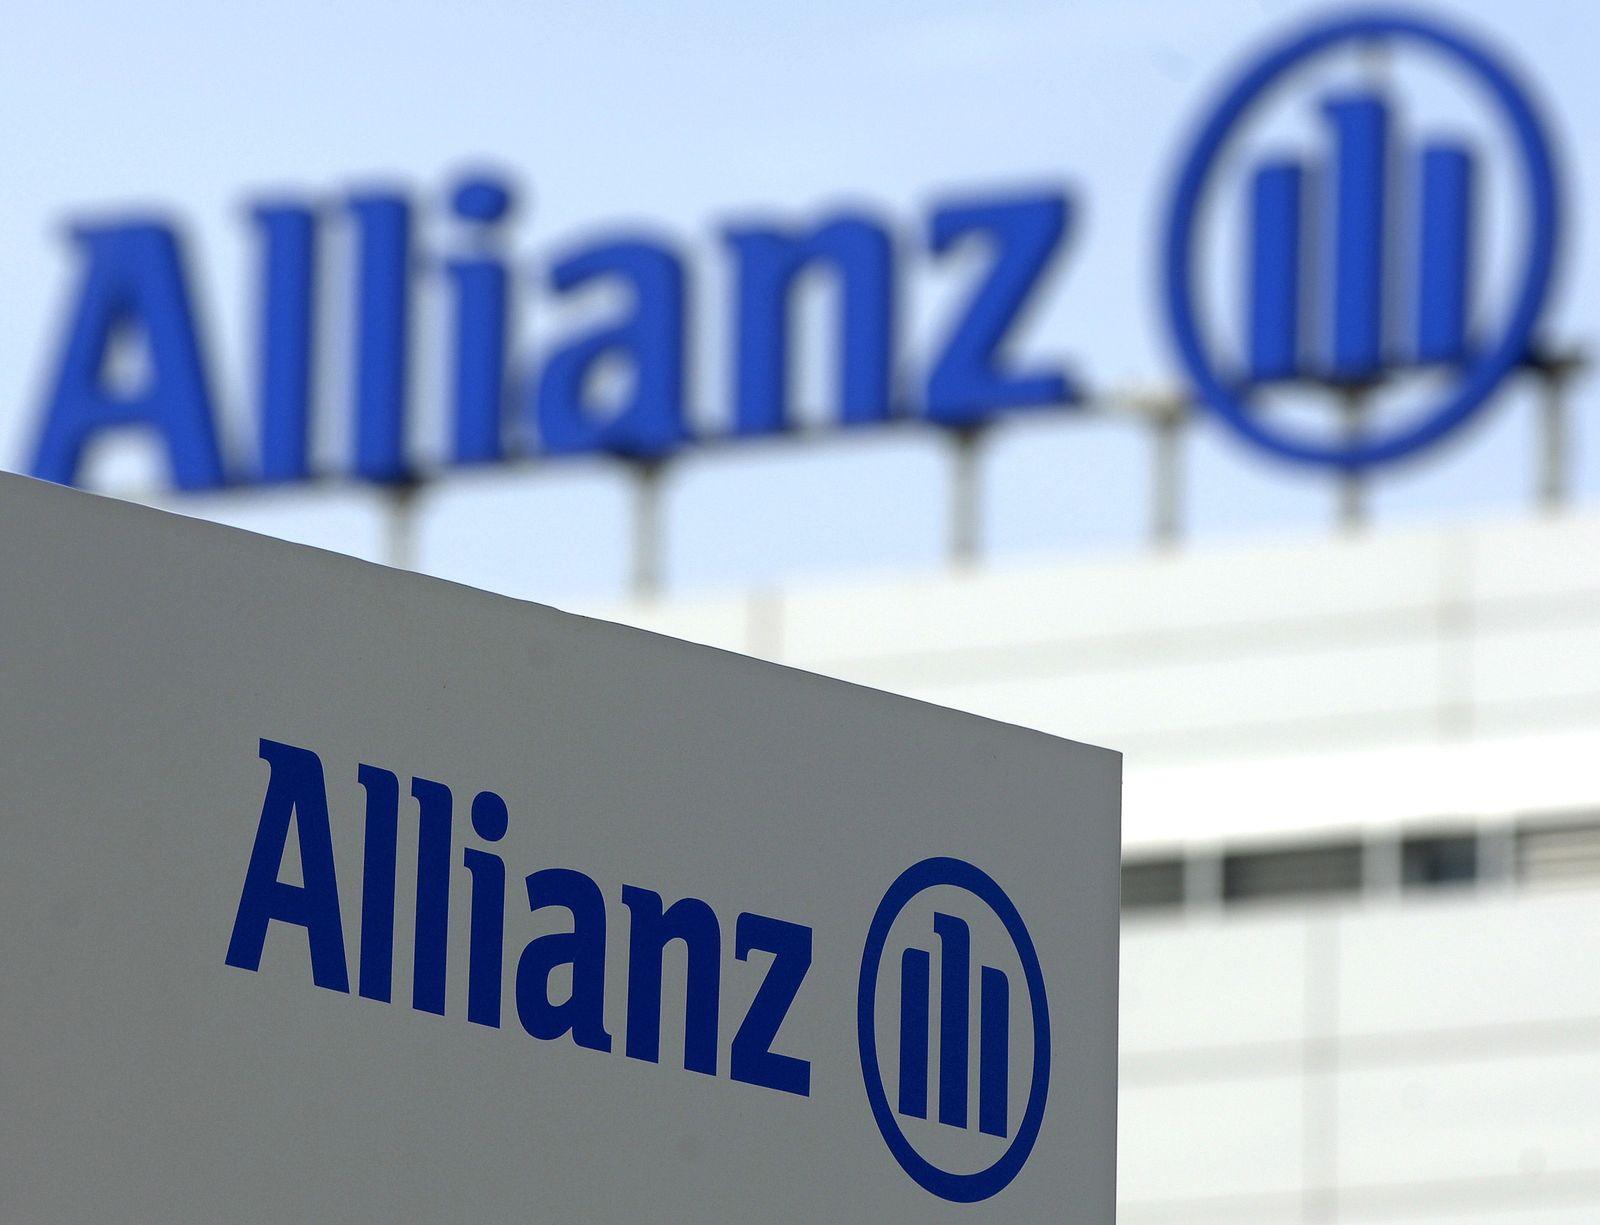 Allianz erzielt 2009 Milliardengewinn